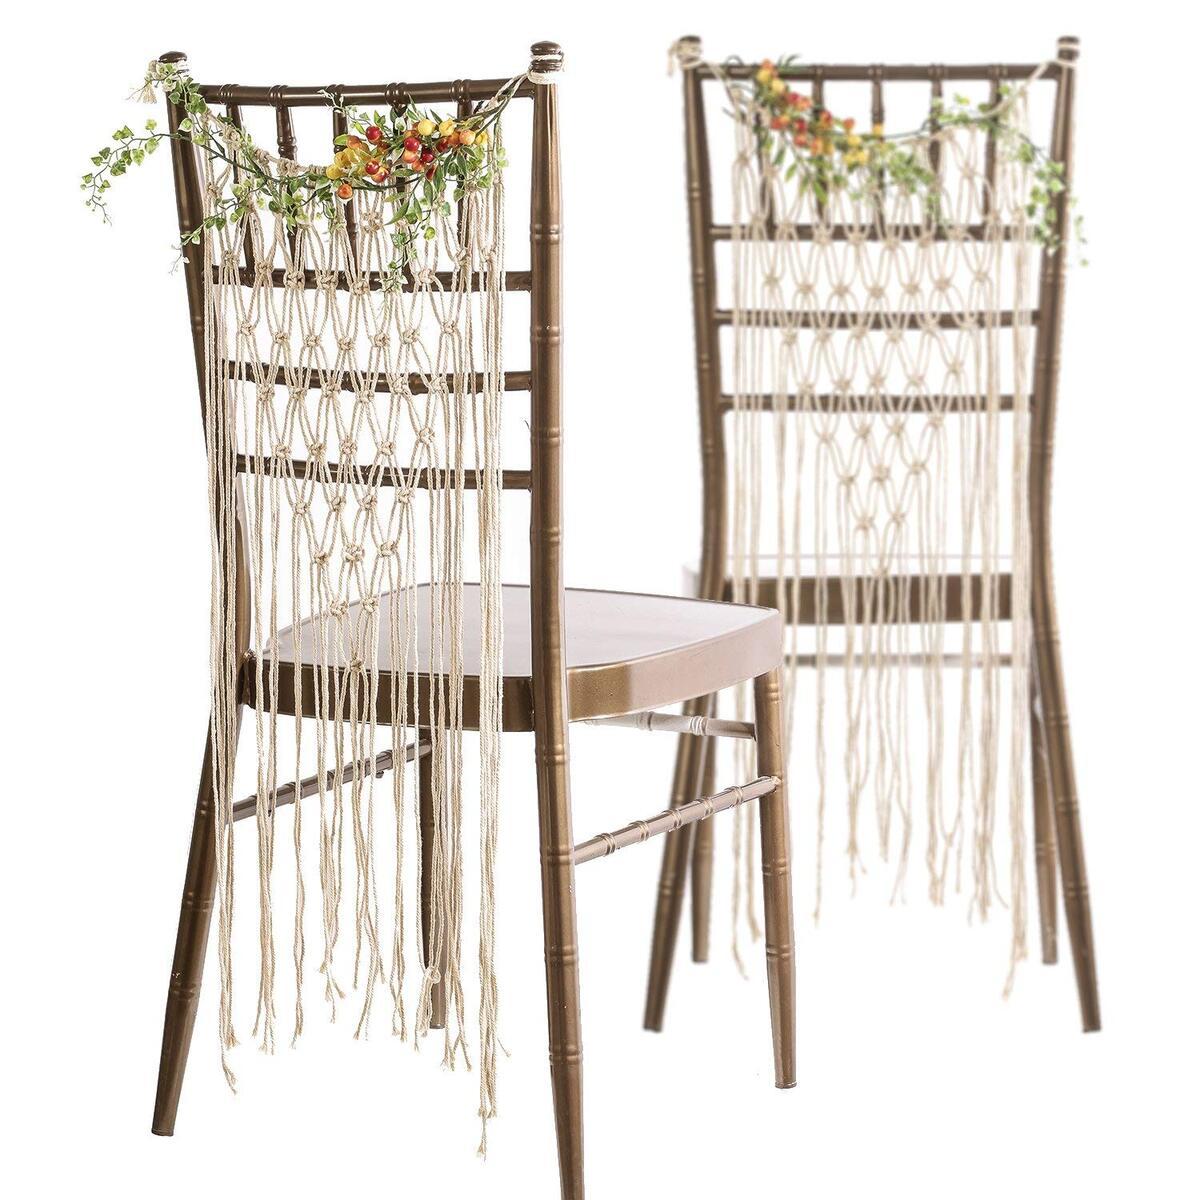 where to find cheap wedding decor online